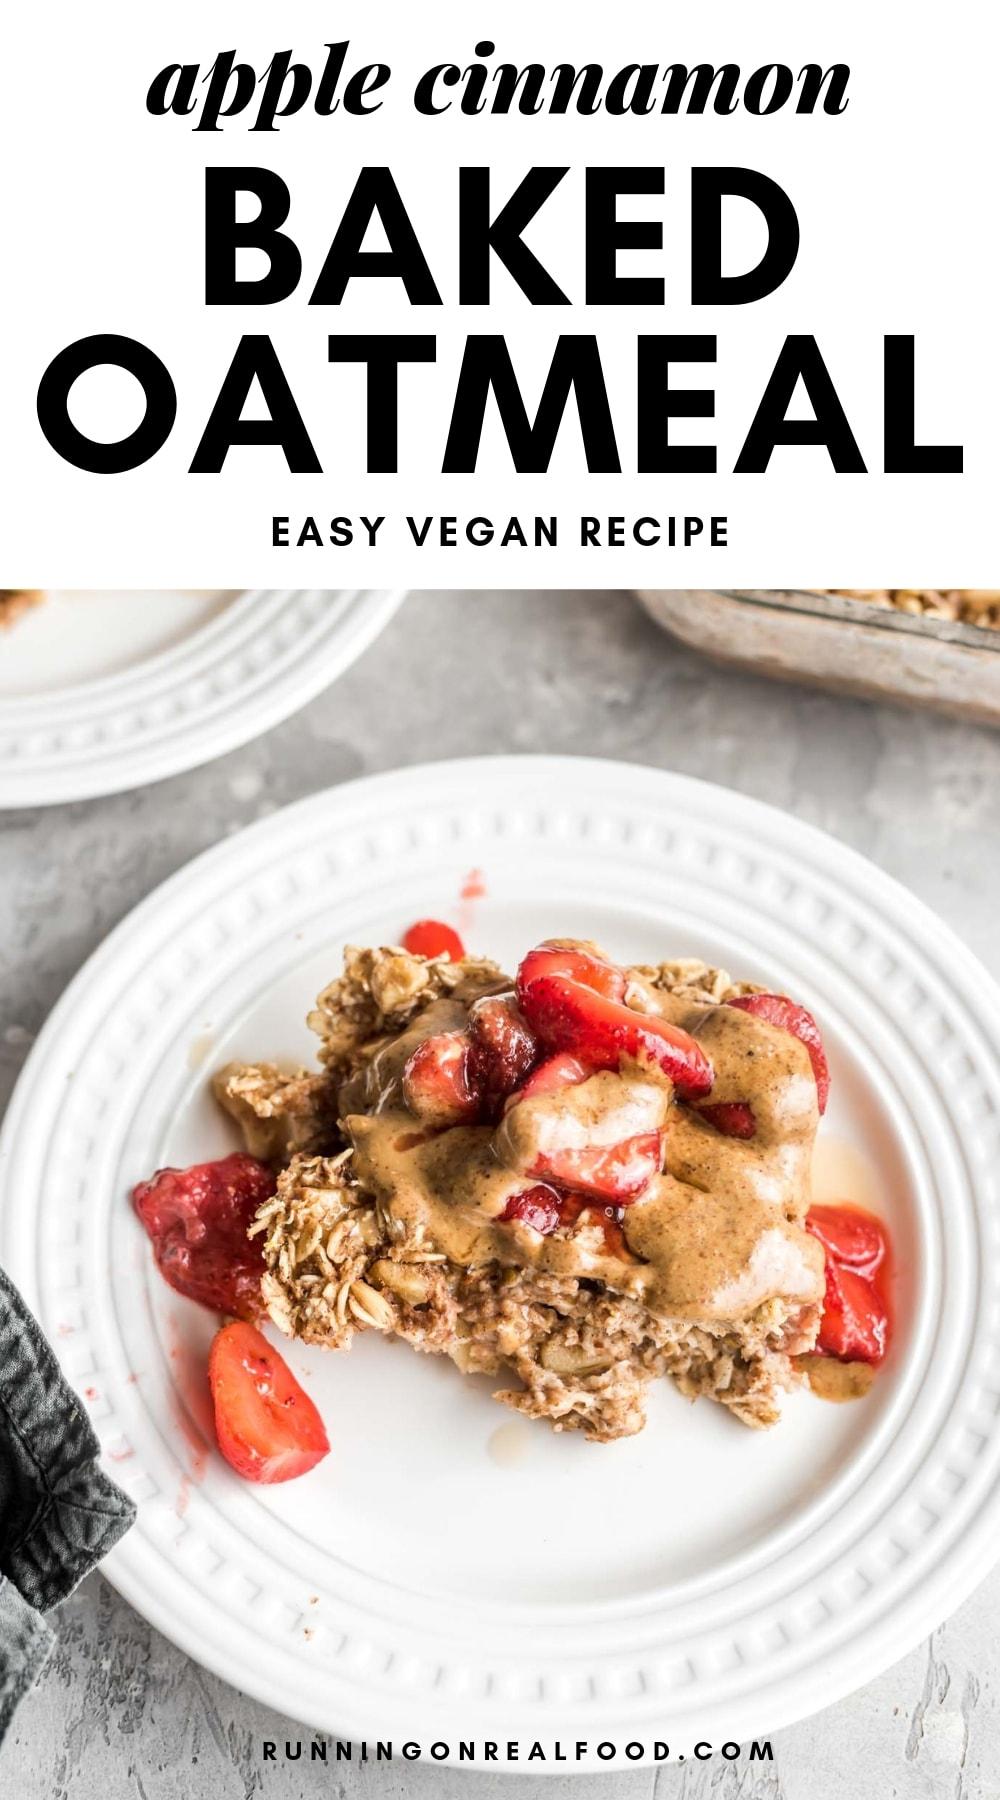 Apple Cinnamon Baked Oatmeal Pinterest Graphic